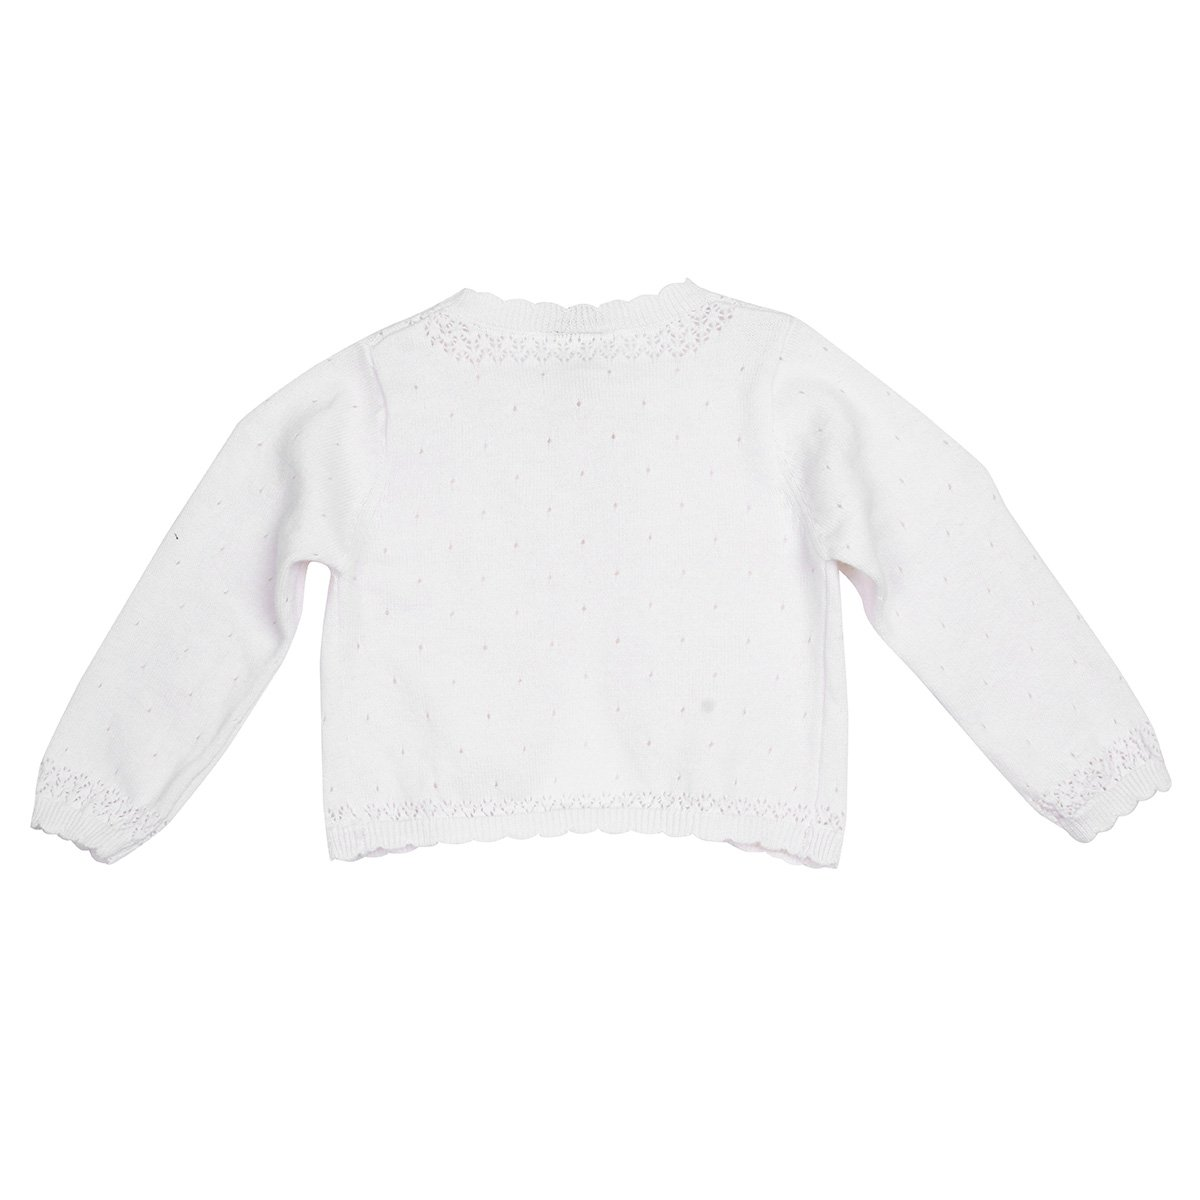 CHICTRY Infant Girls Lace Floral Knitted Ruffle Bolero Jacket Shrug Short Cardigan Dress Cover up